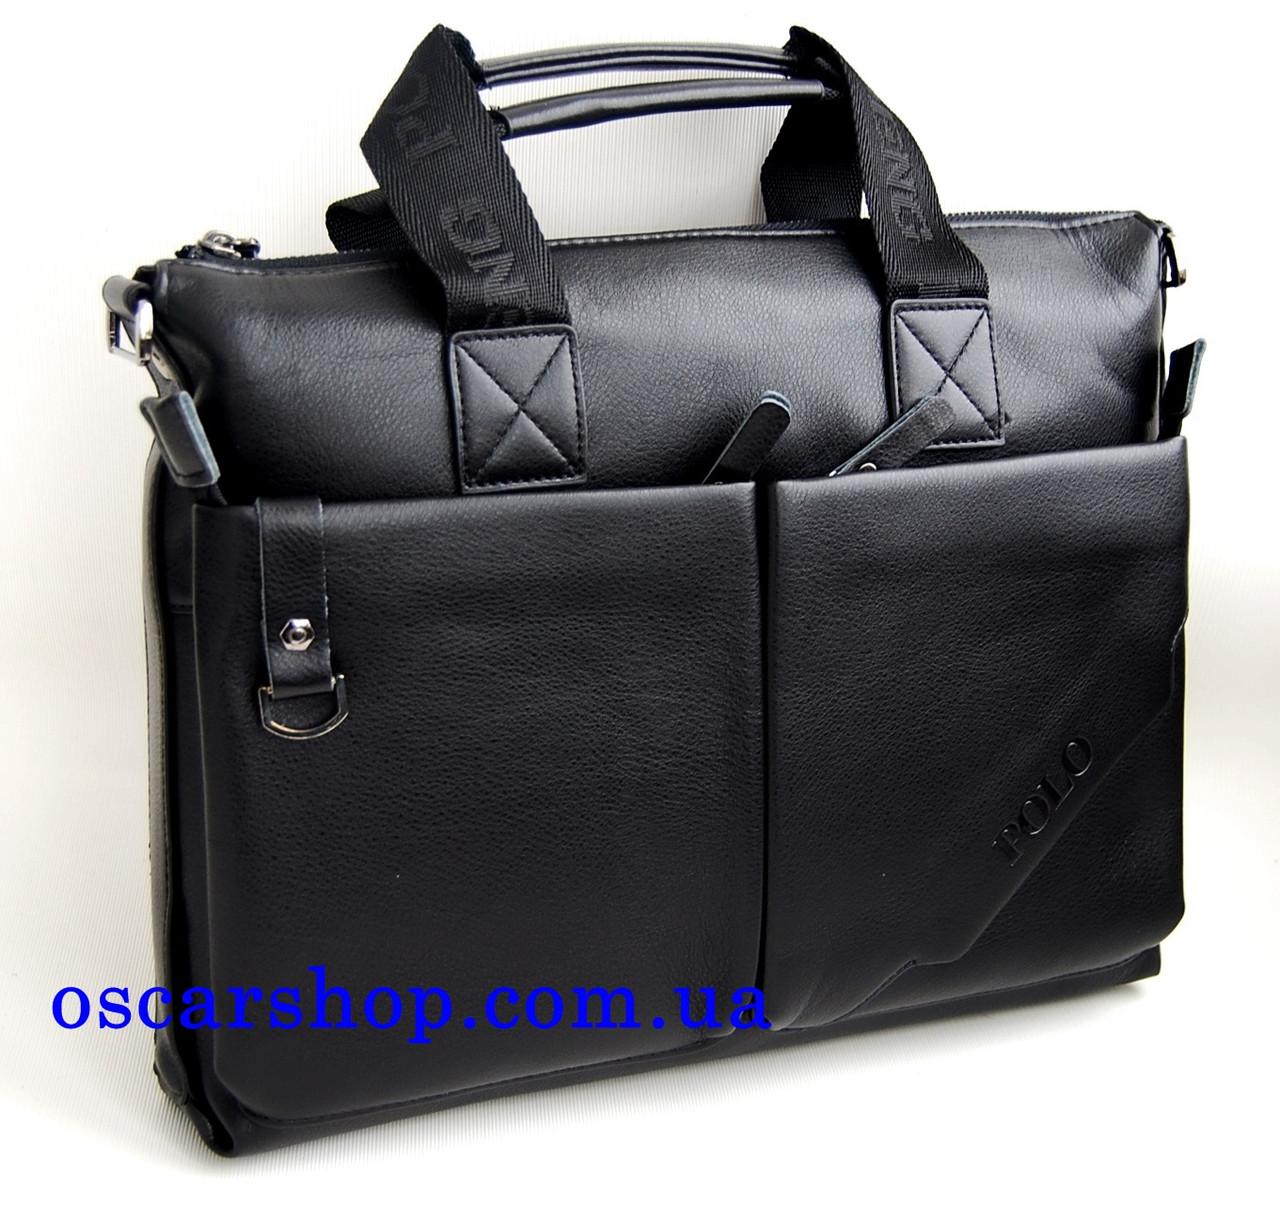 b1371fe0b238 Мужская сумка-портфель Polo под формат А4 КС10-3 - интернет-магазин